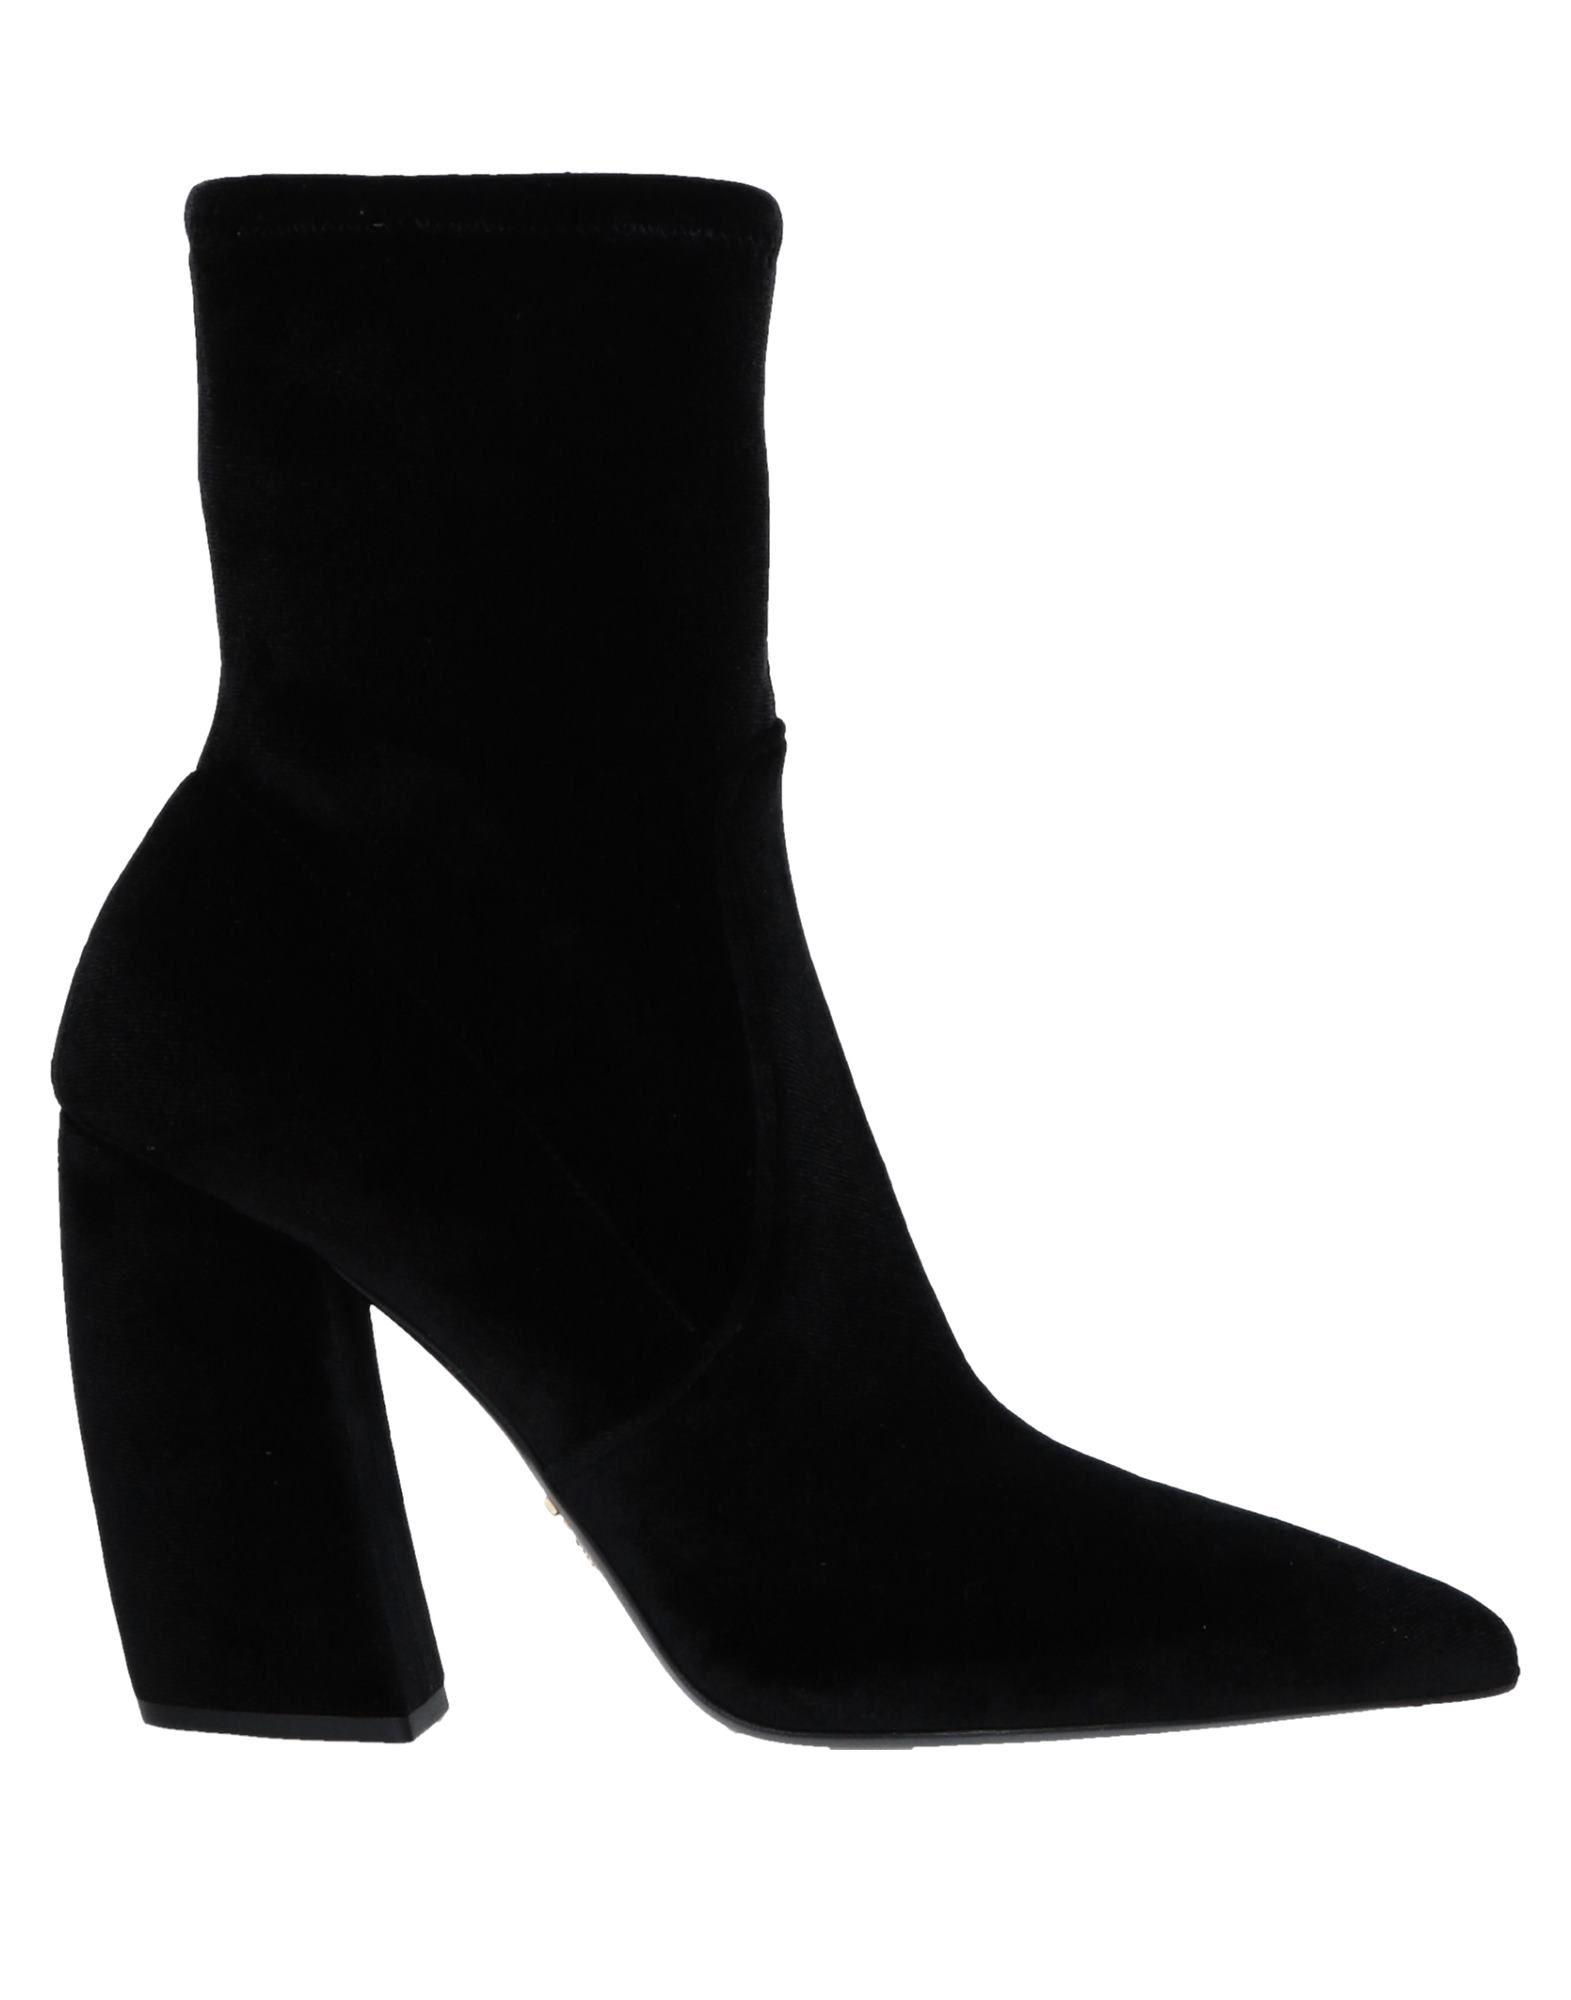 Bottine Prada Femme - Bottines Prada Noir Chaussures casual sauvages